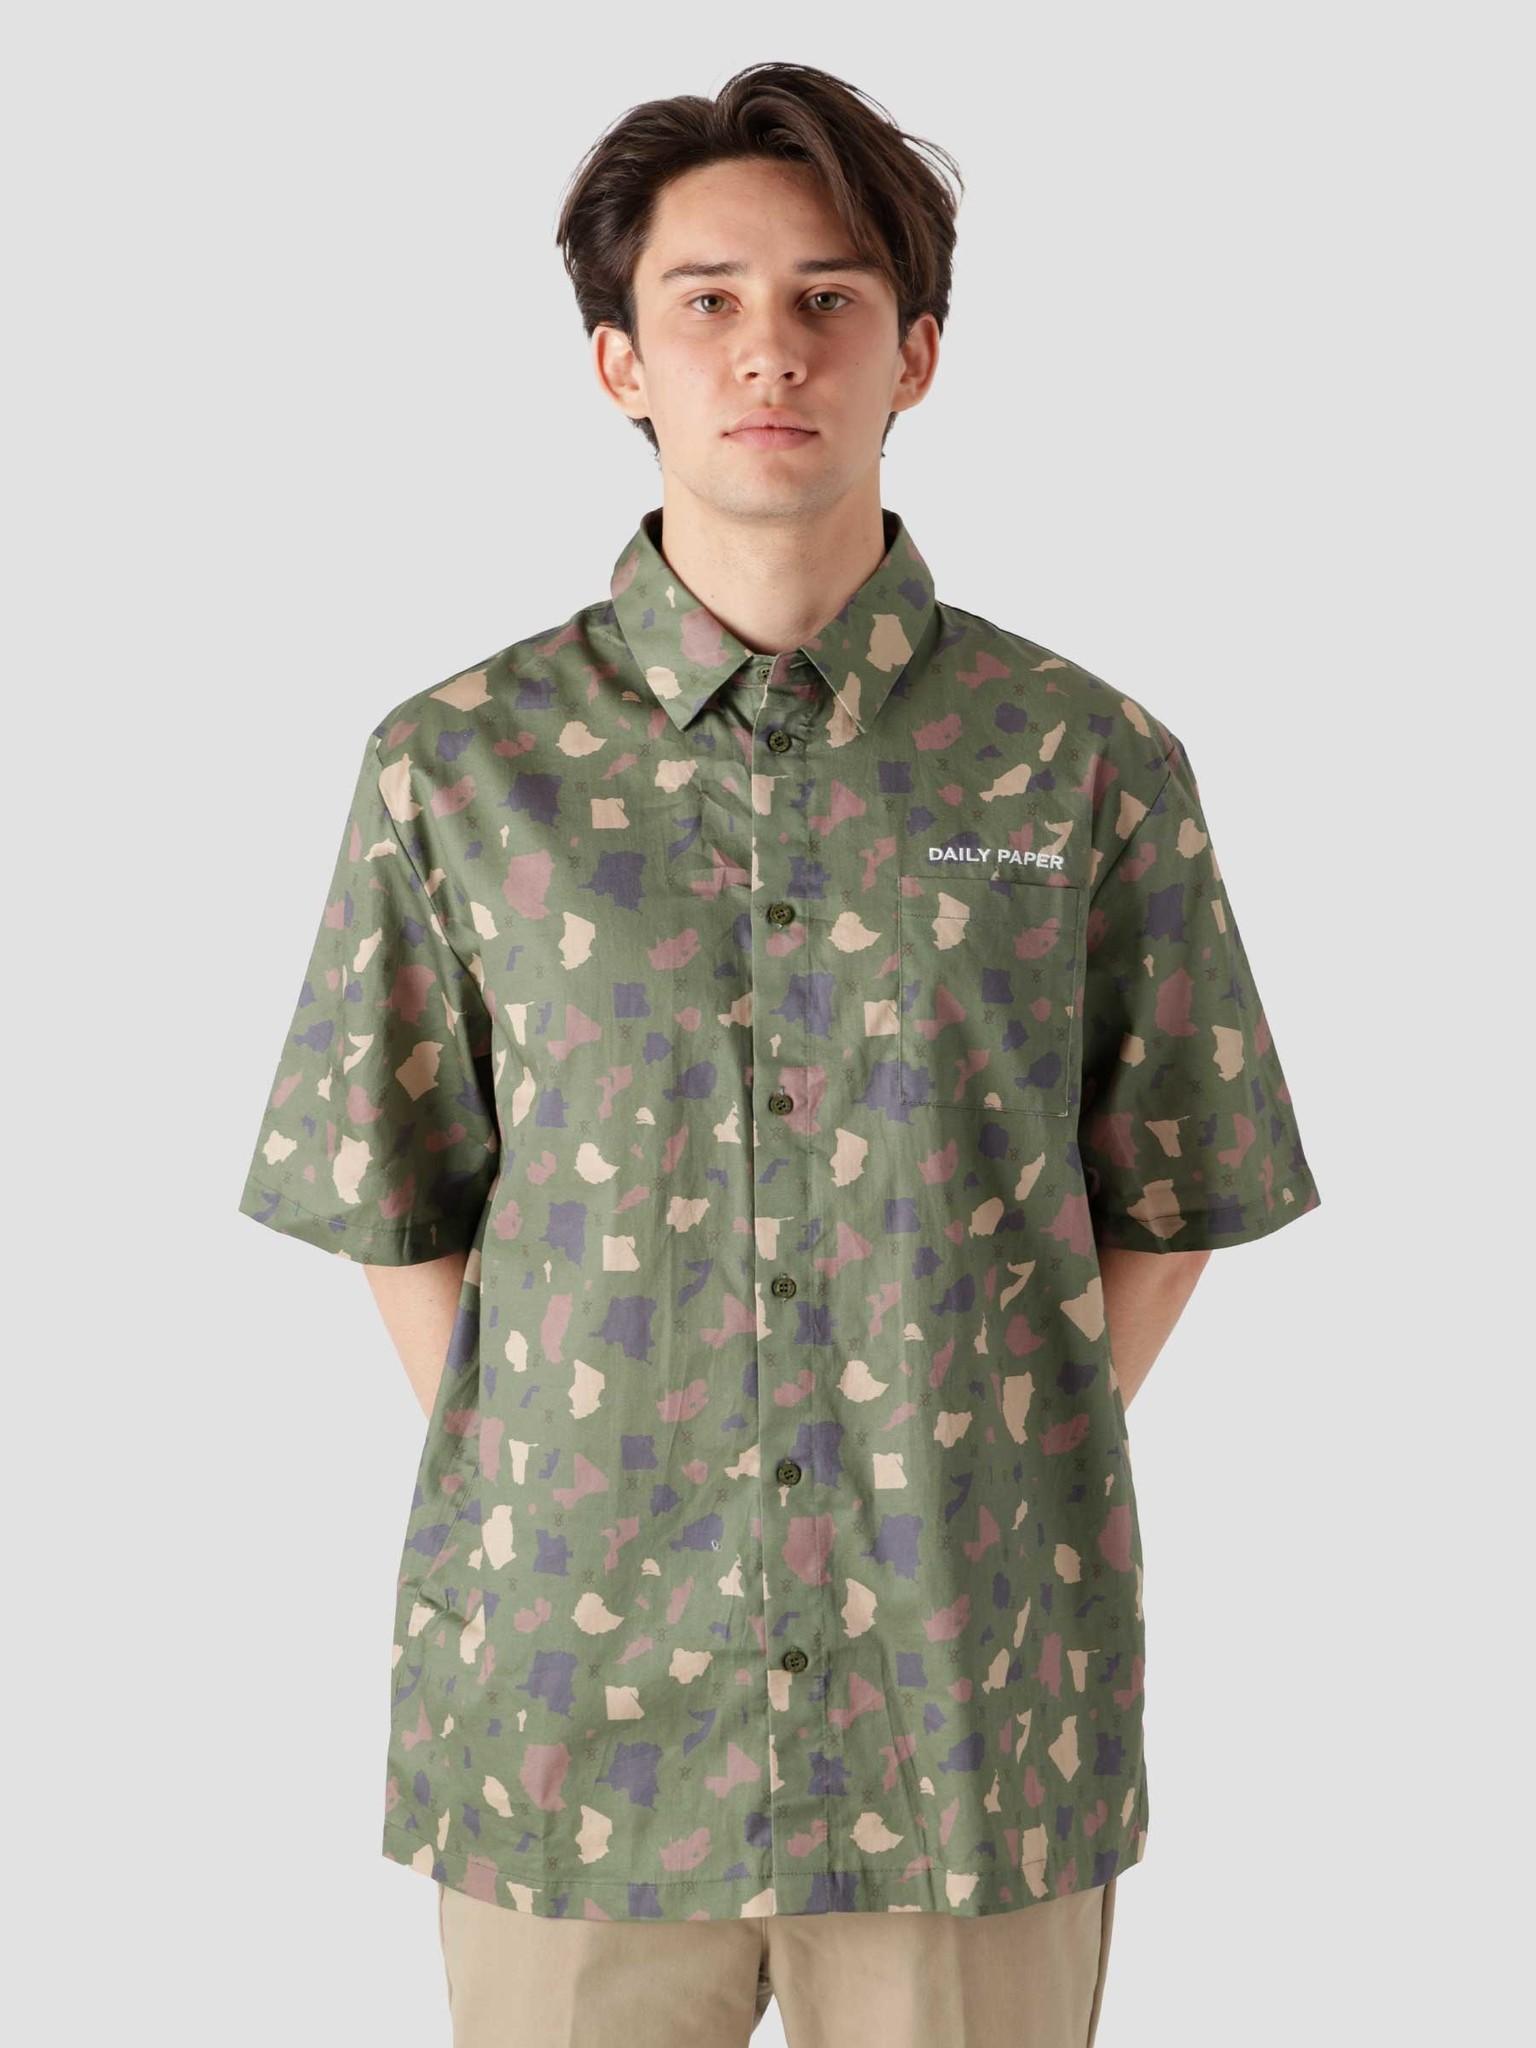 Daily Paper Daily Paper Recomo Shirt Green Camo 2113006